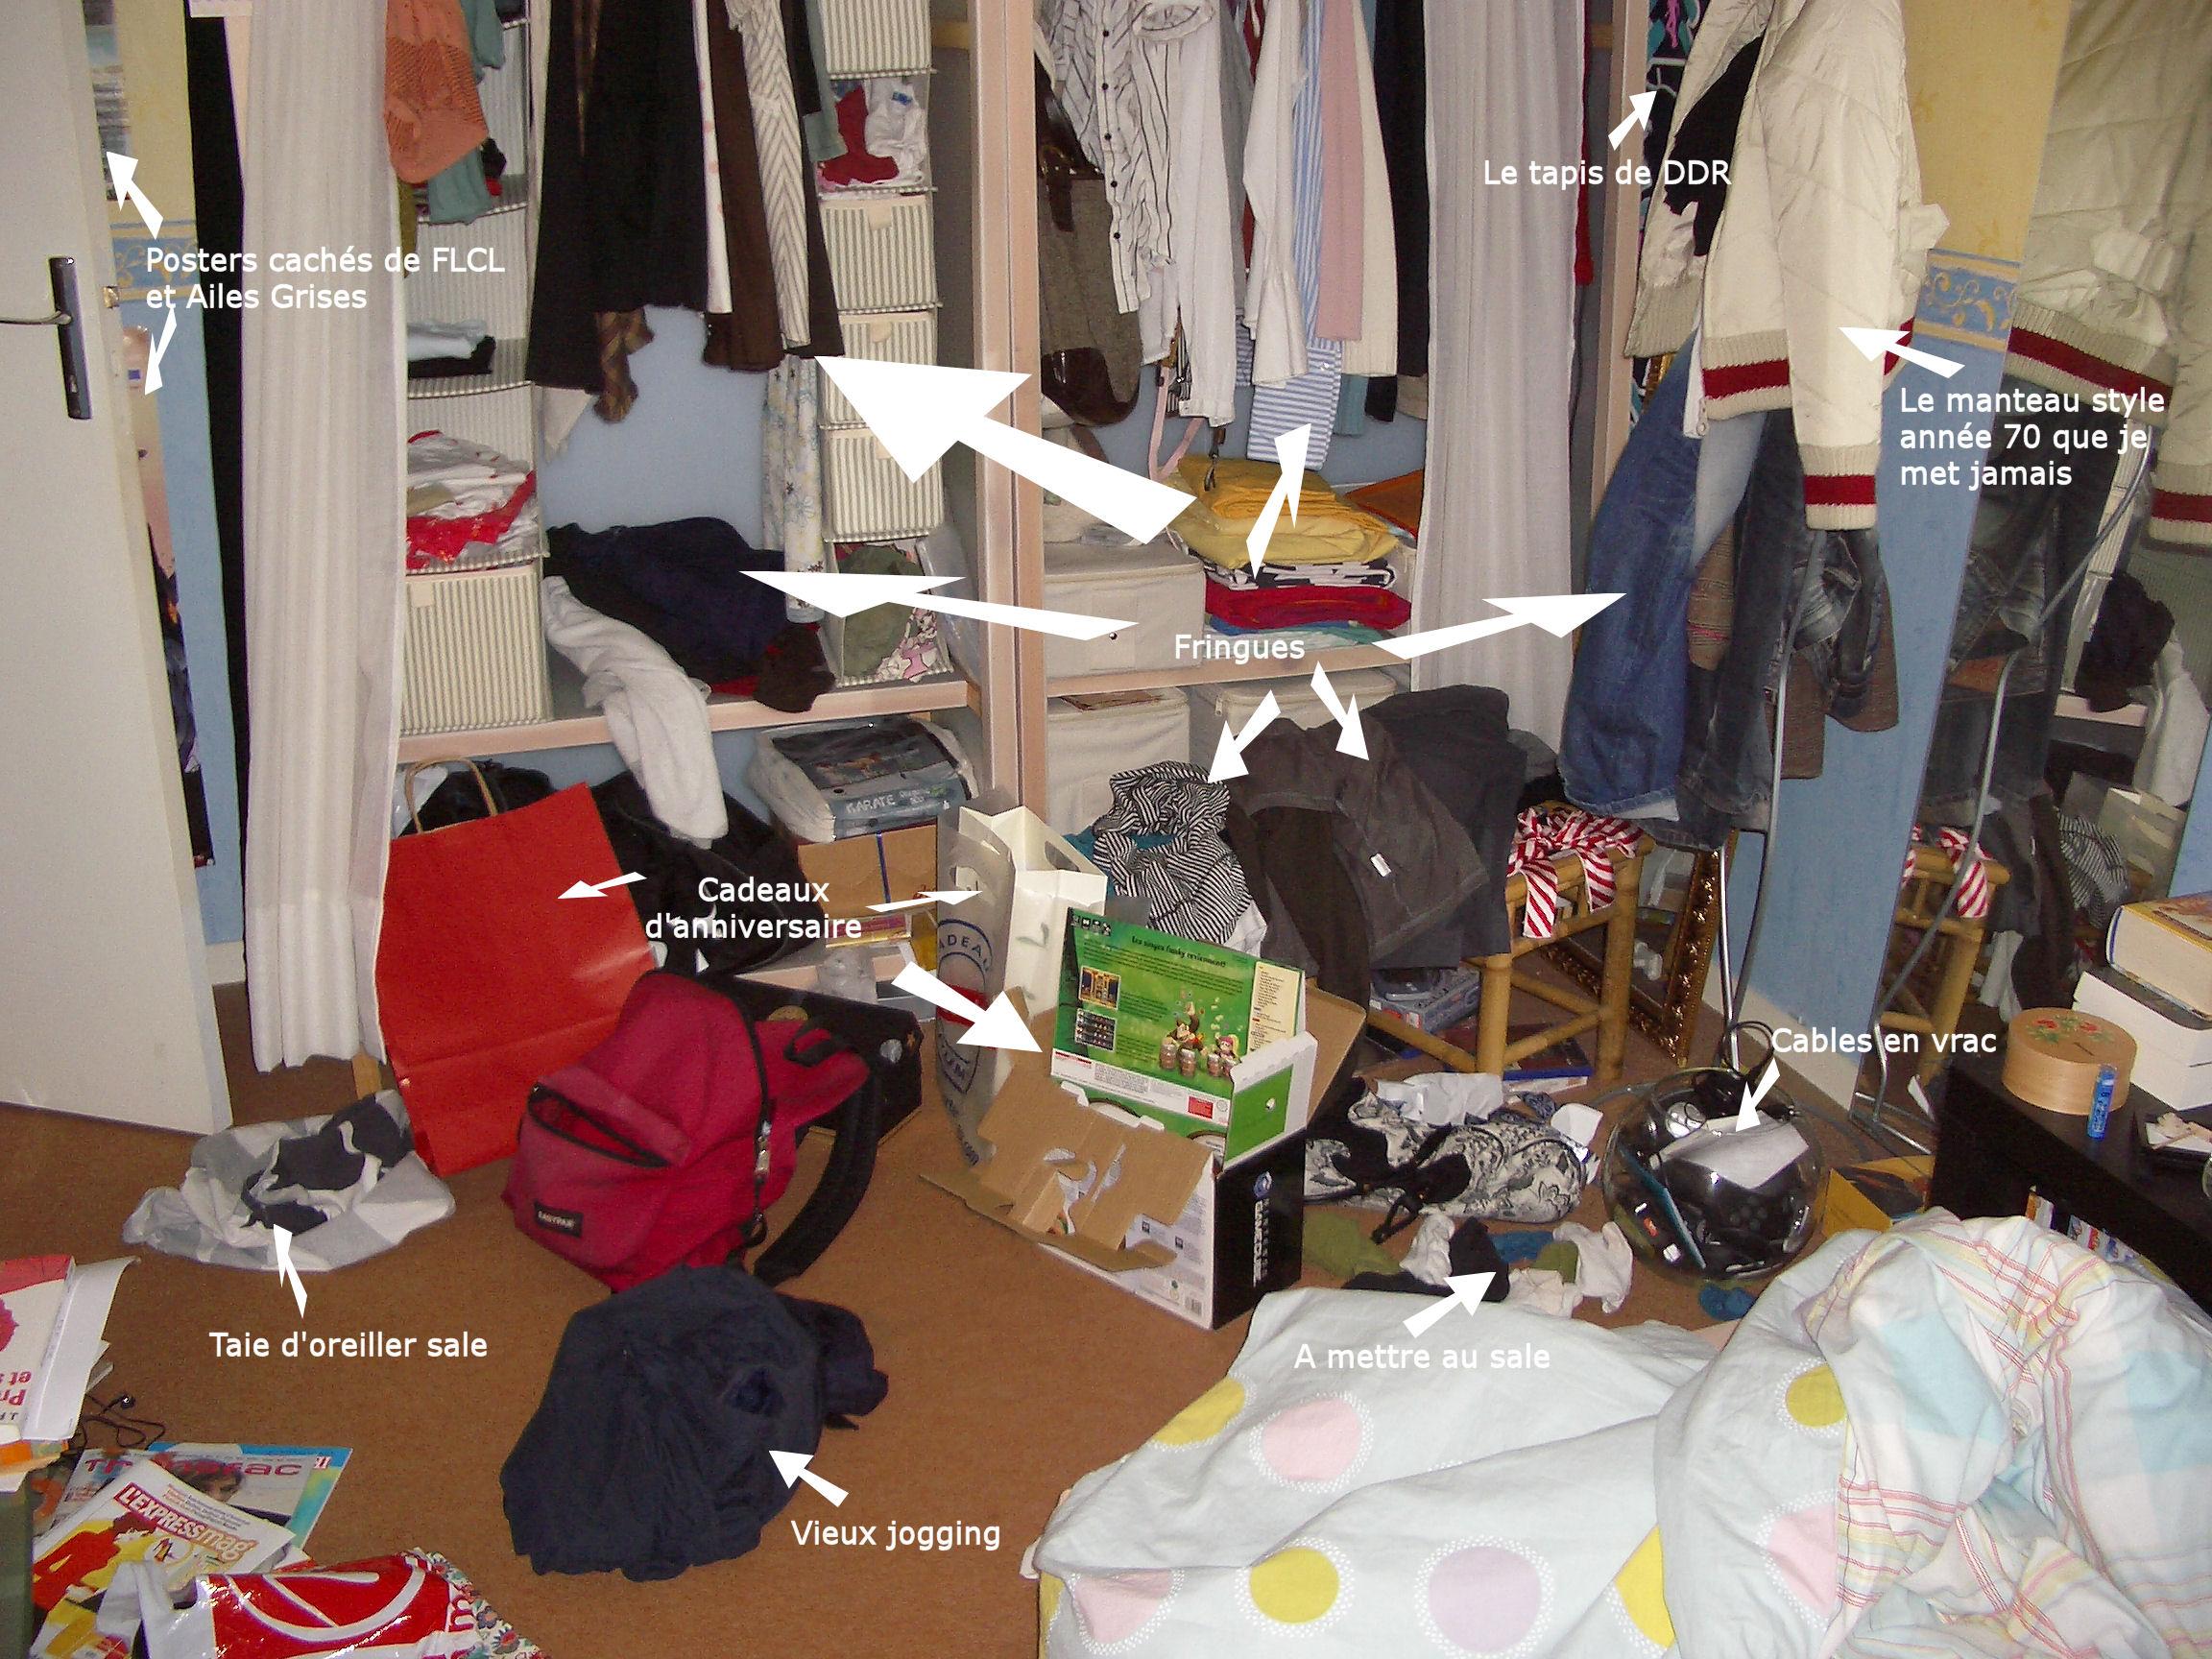 chambre bordel - Chambre Bordel